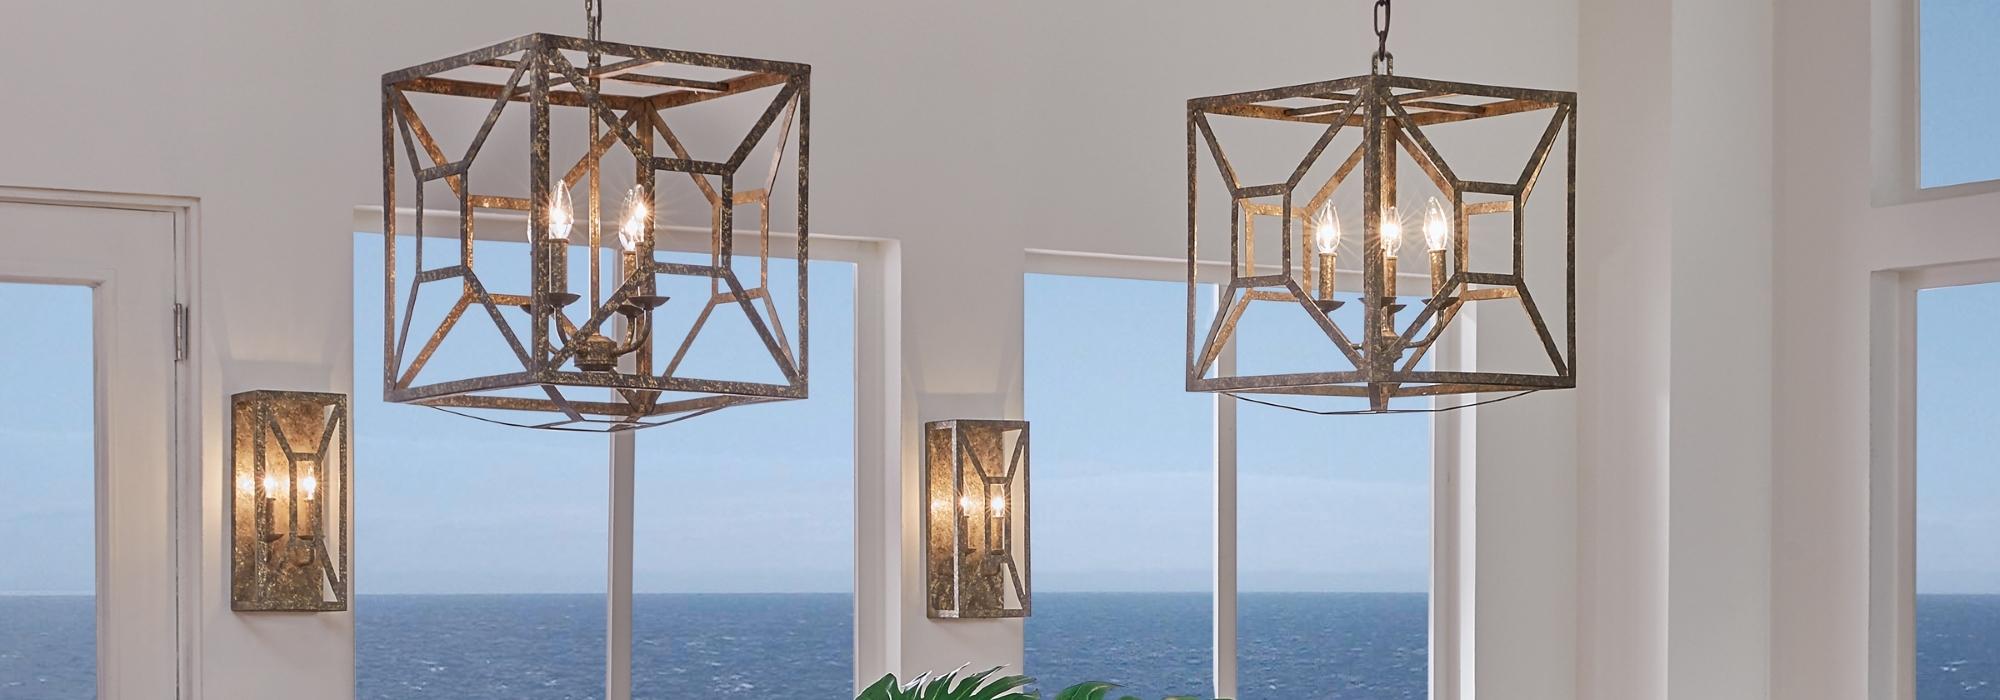 Elegance Lighting Lighting Ideas